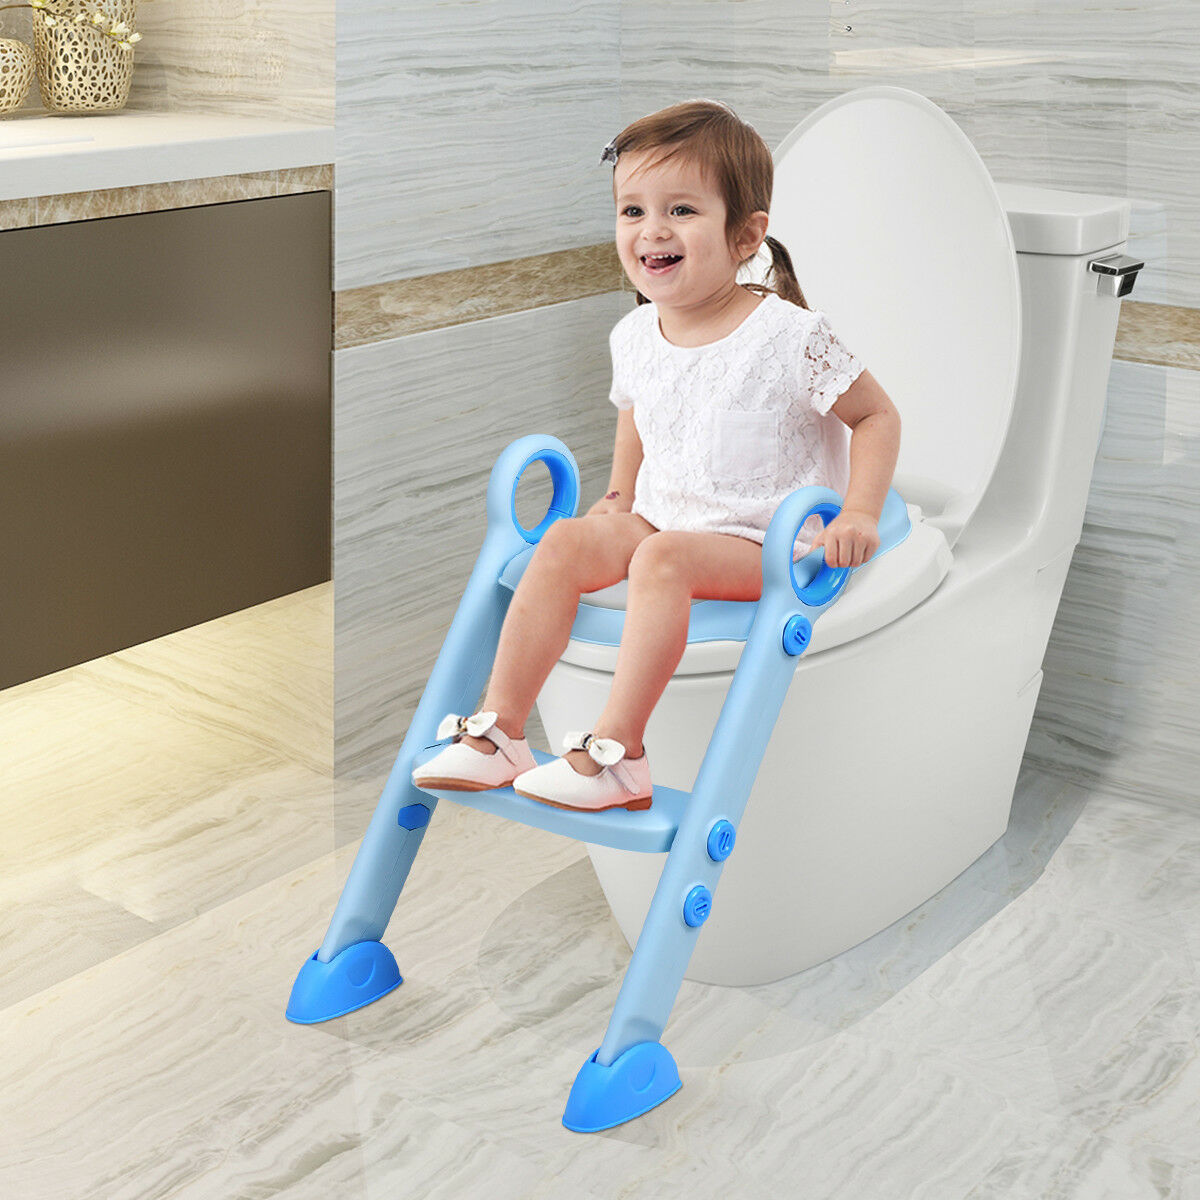 Toddler Toilet Potty Training Seat with Sturdy Non-Slip Ladder Step Boys /& Girls